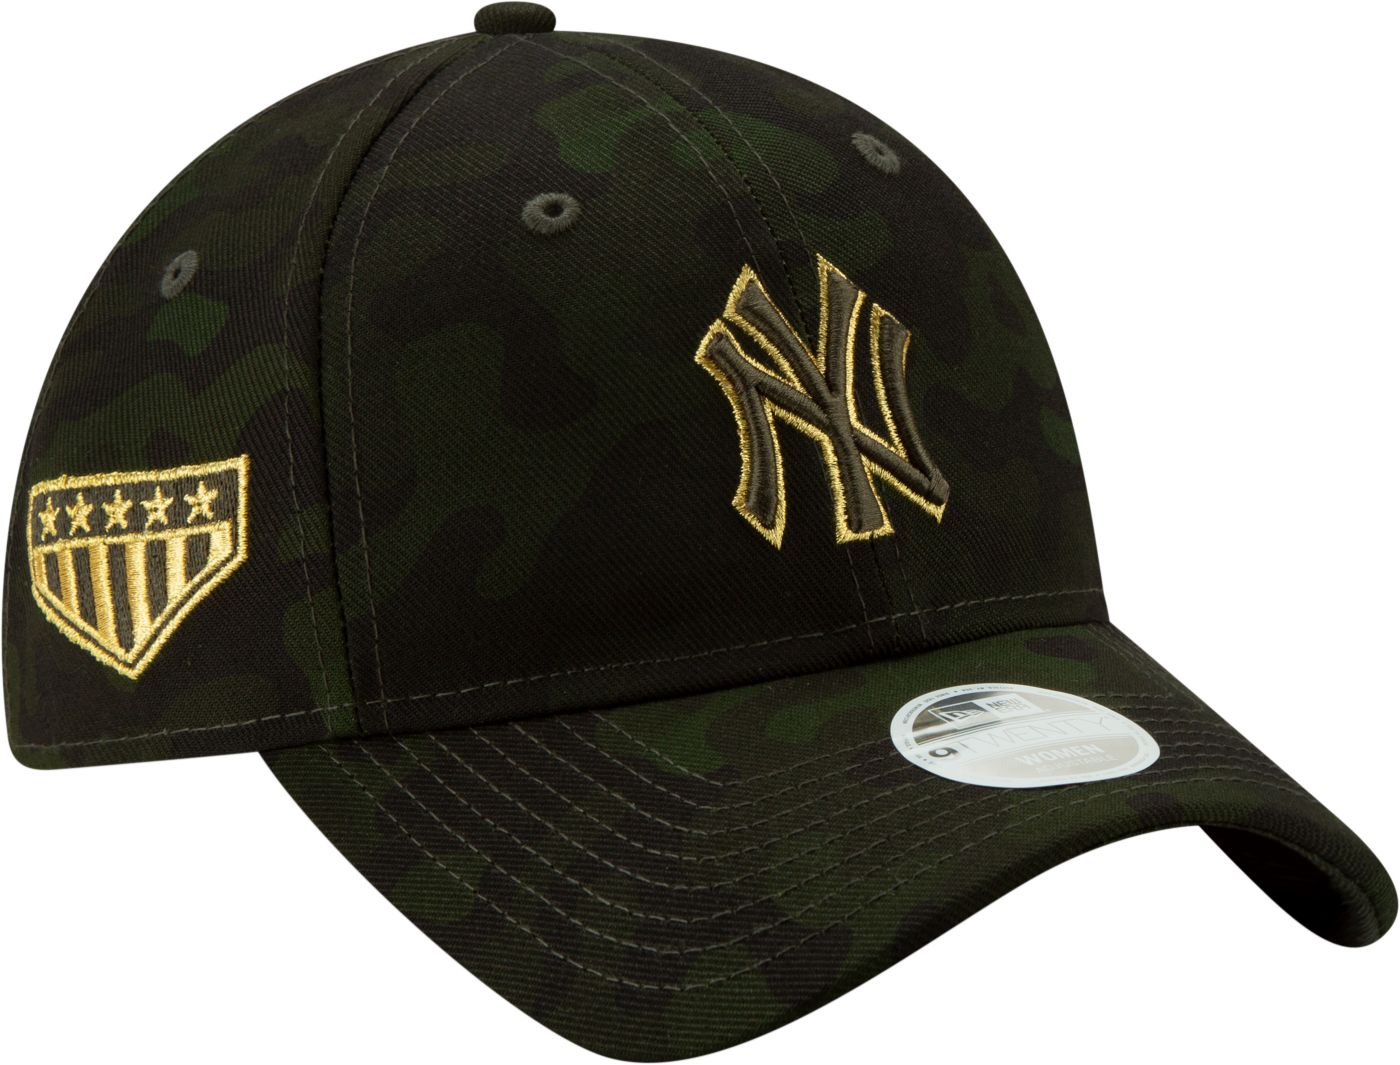 New Era Women's New York Yankees 9Twenty Armed Forces Adjustable Hat